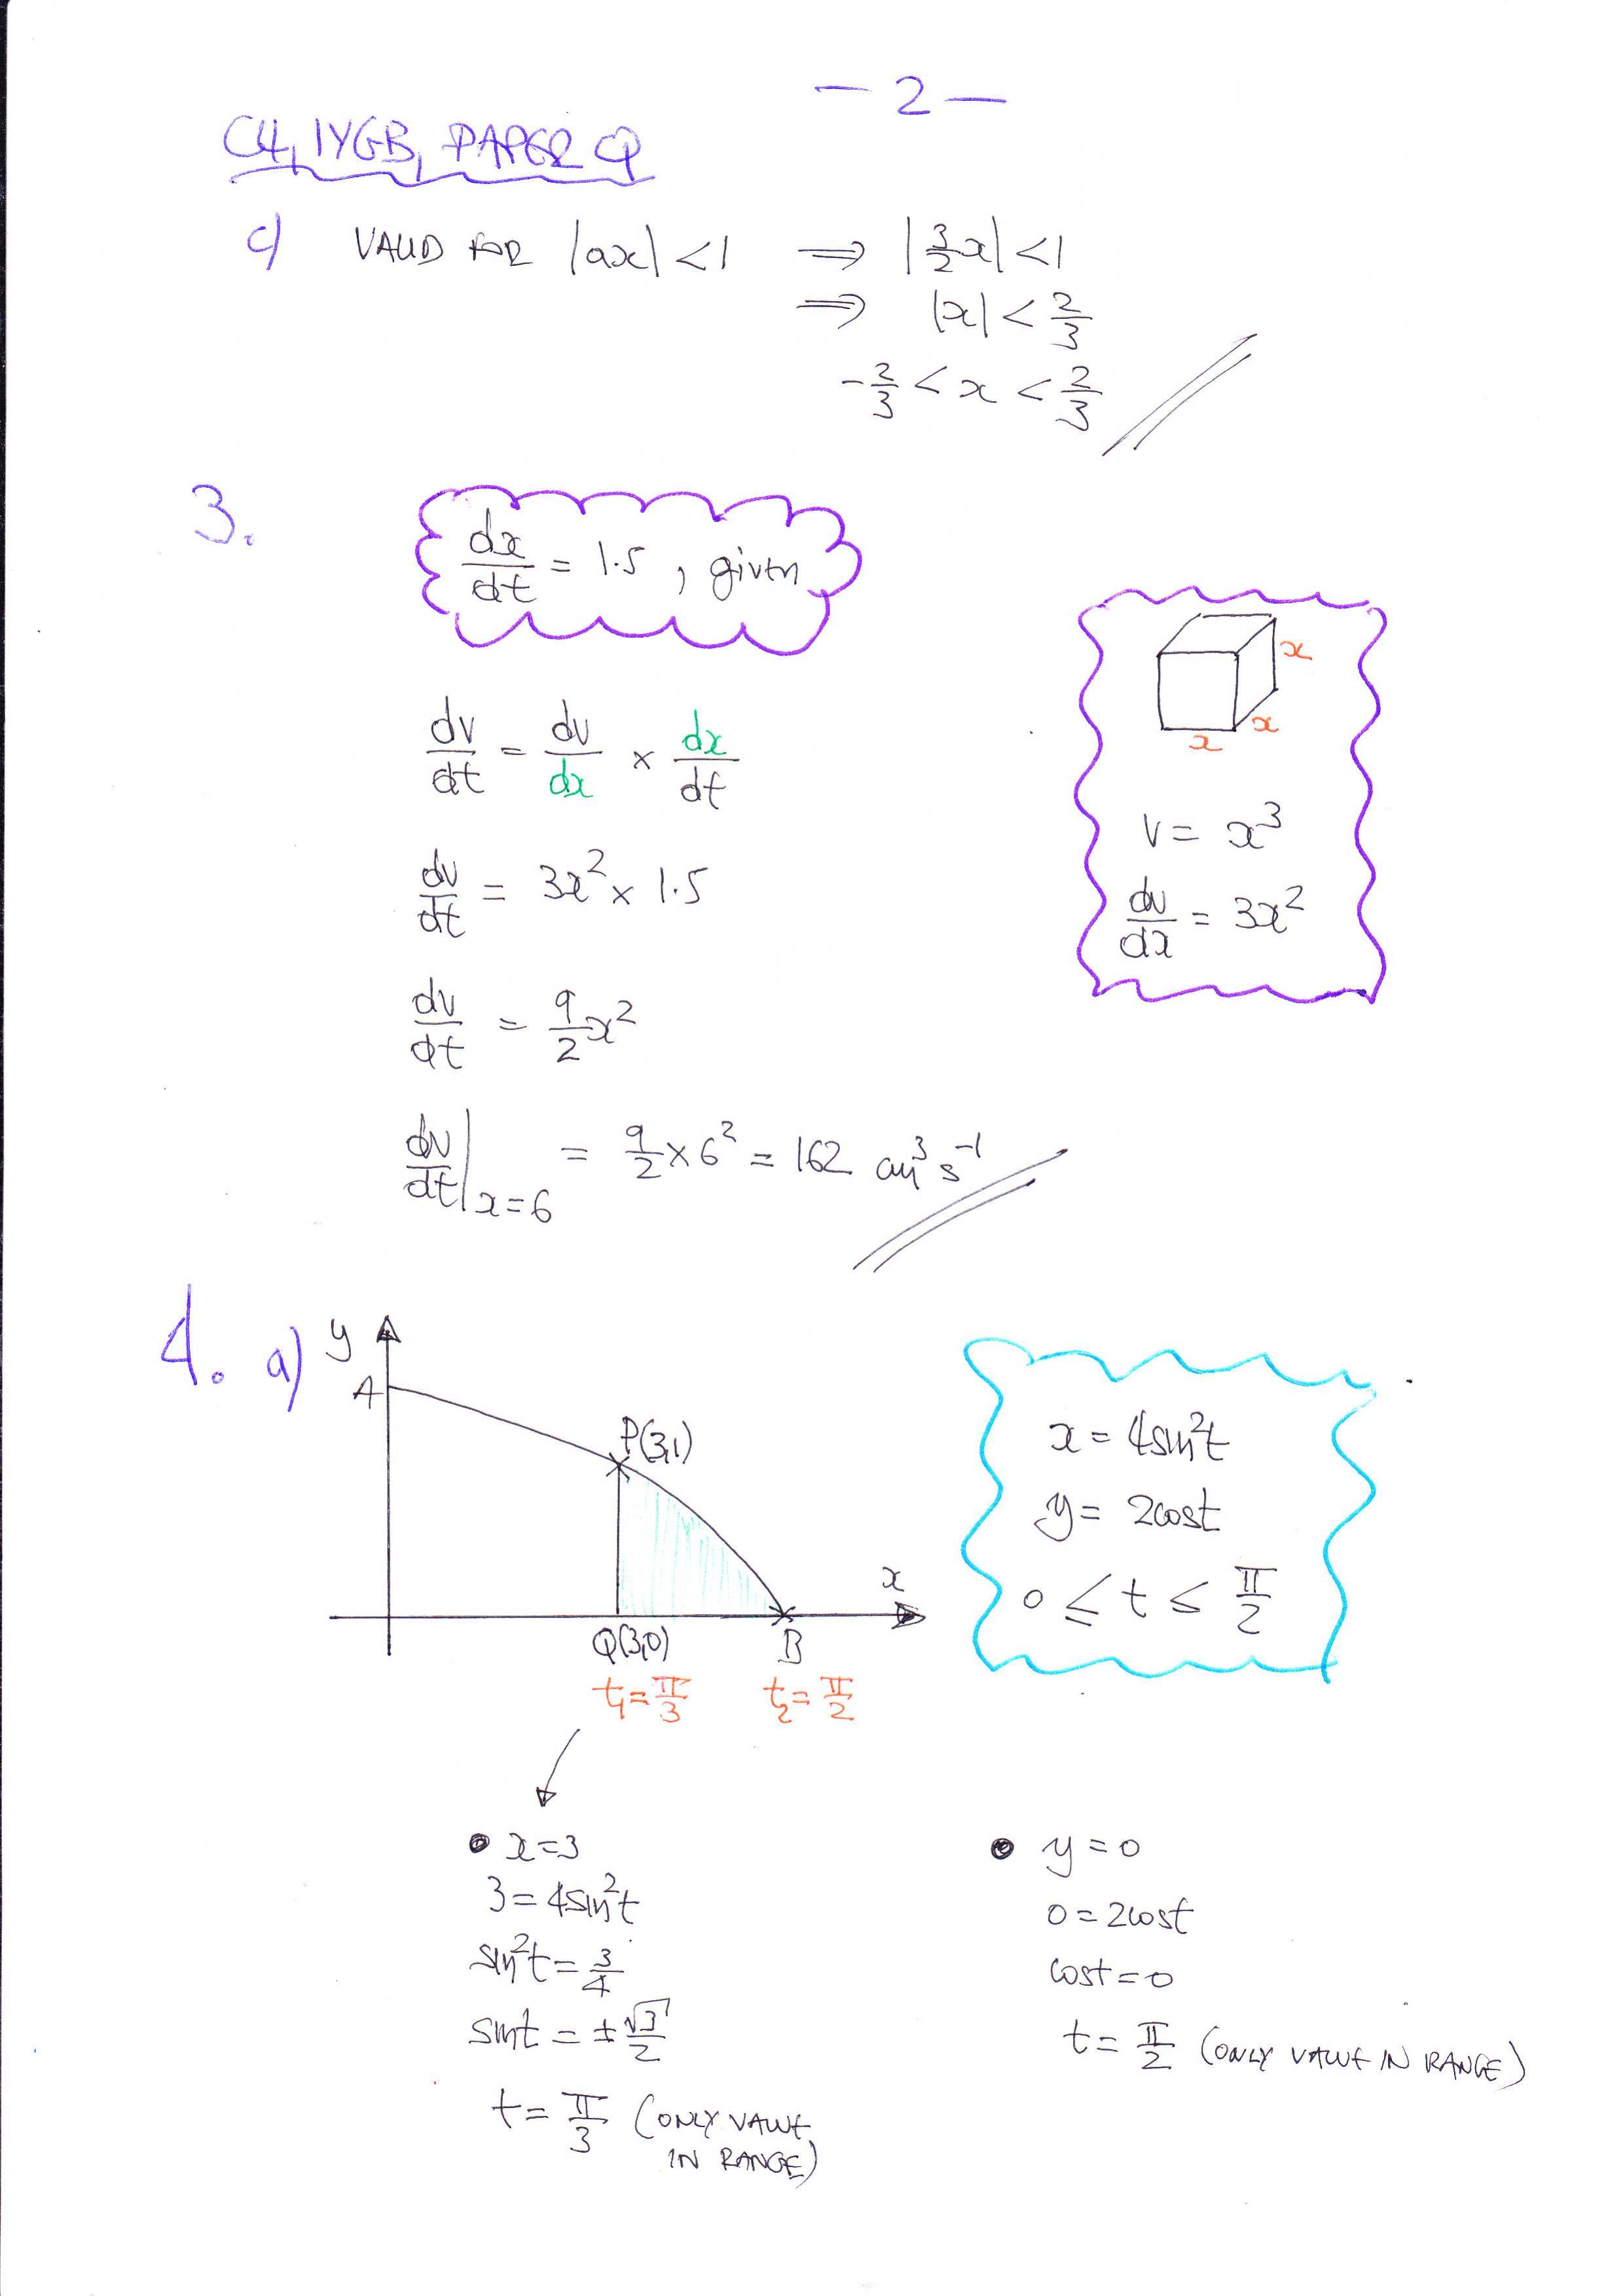 Name:  C4, IYGB, Paper Q, page 2.jpg Views: 78 Size:  329.5 KB